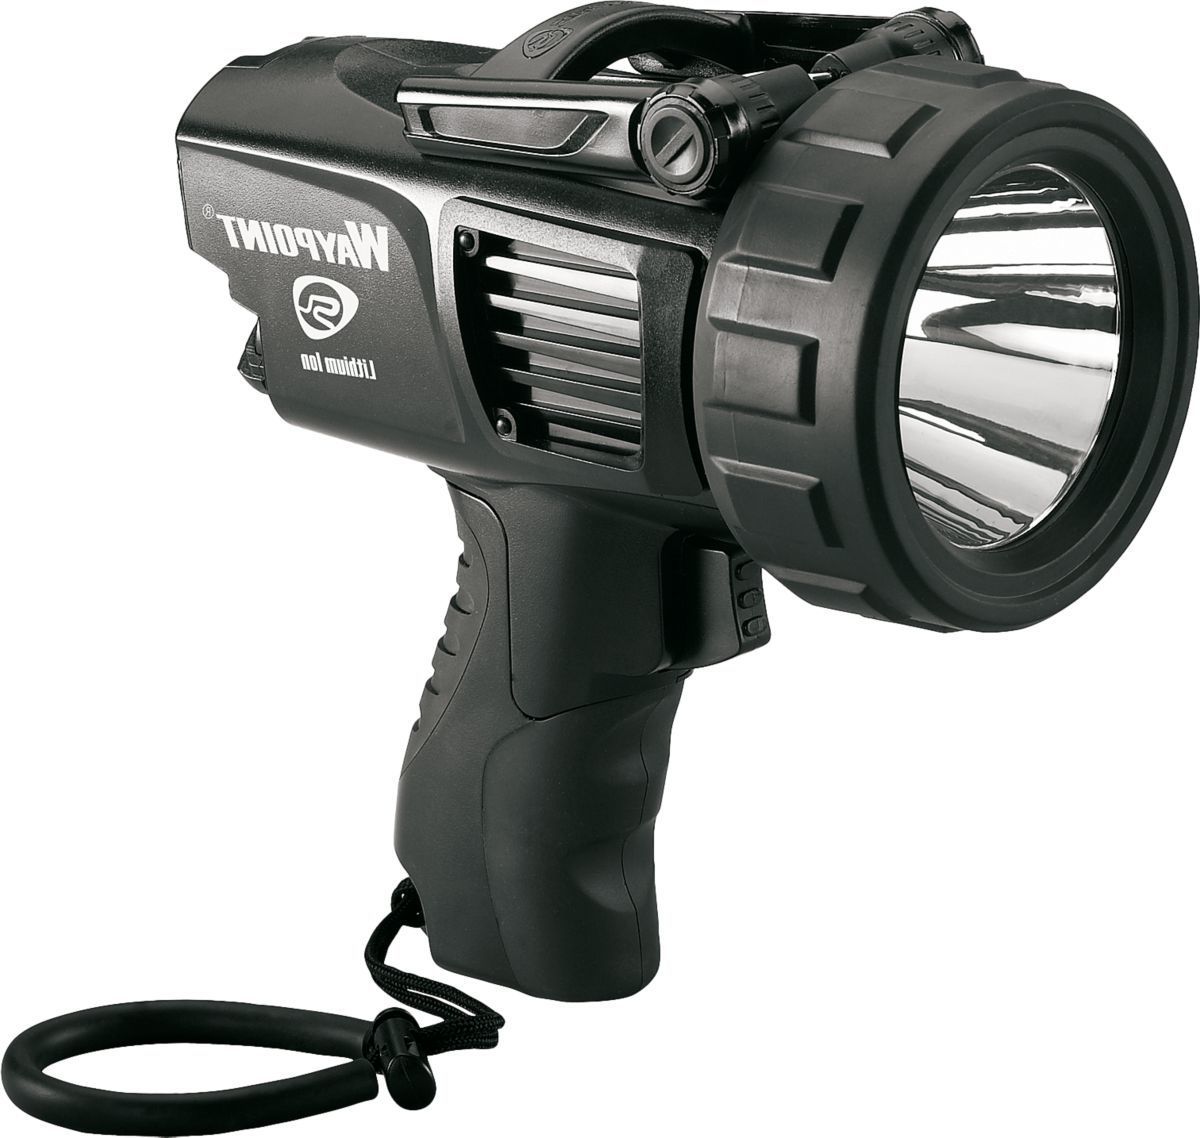 Streamlight® Waypoint® Lithium-Ion Rechargeable Spotlight